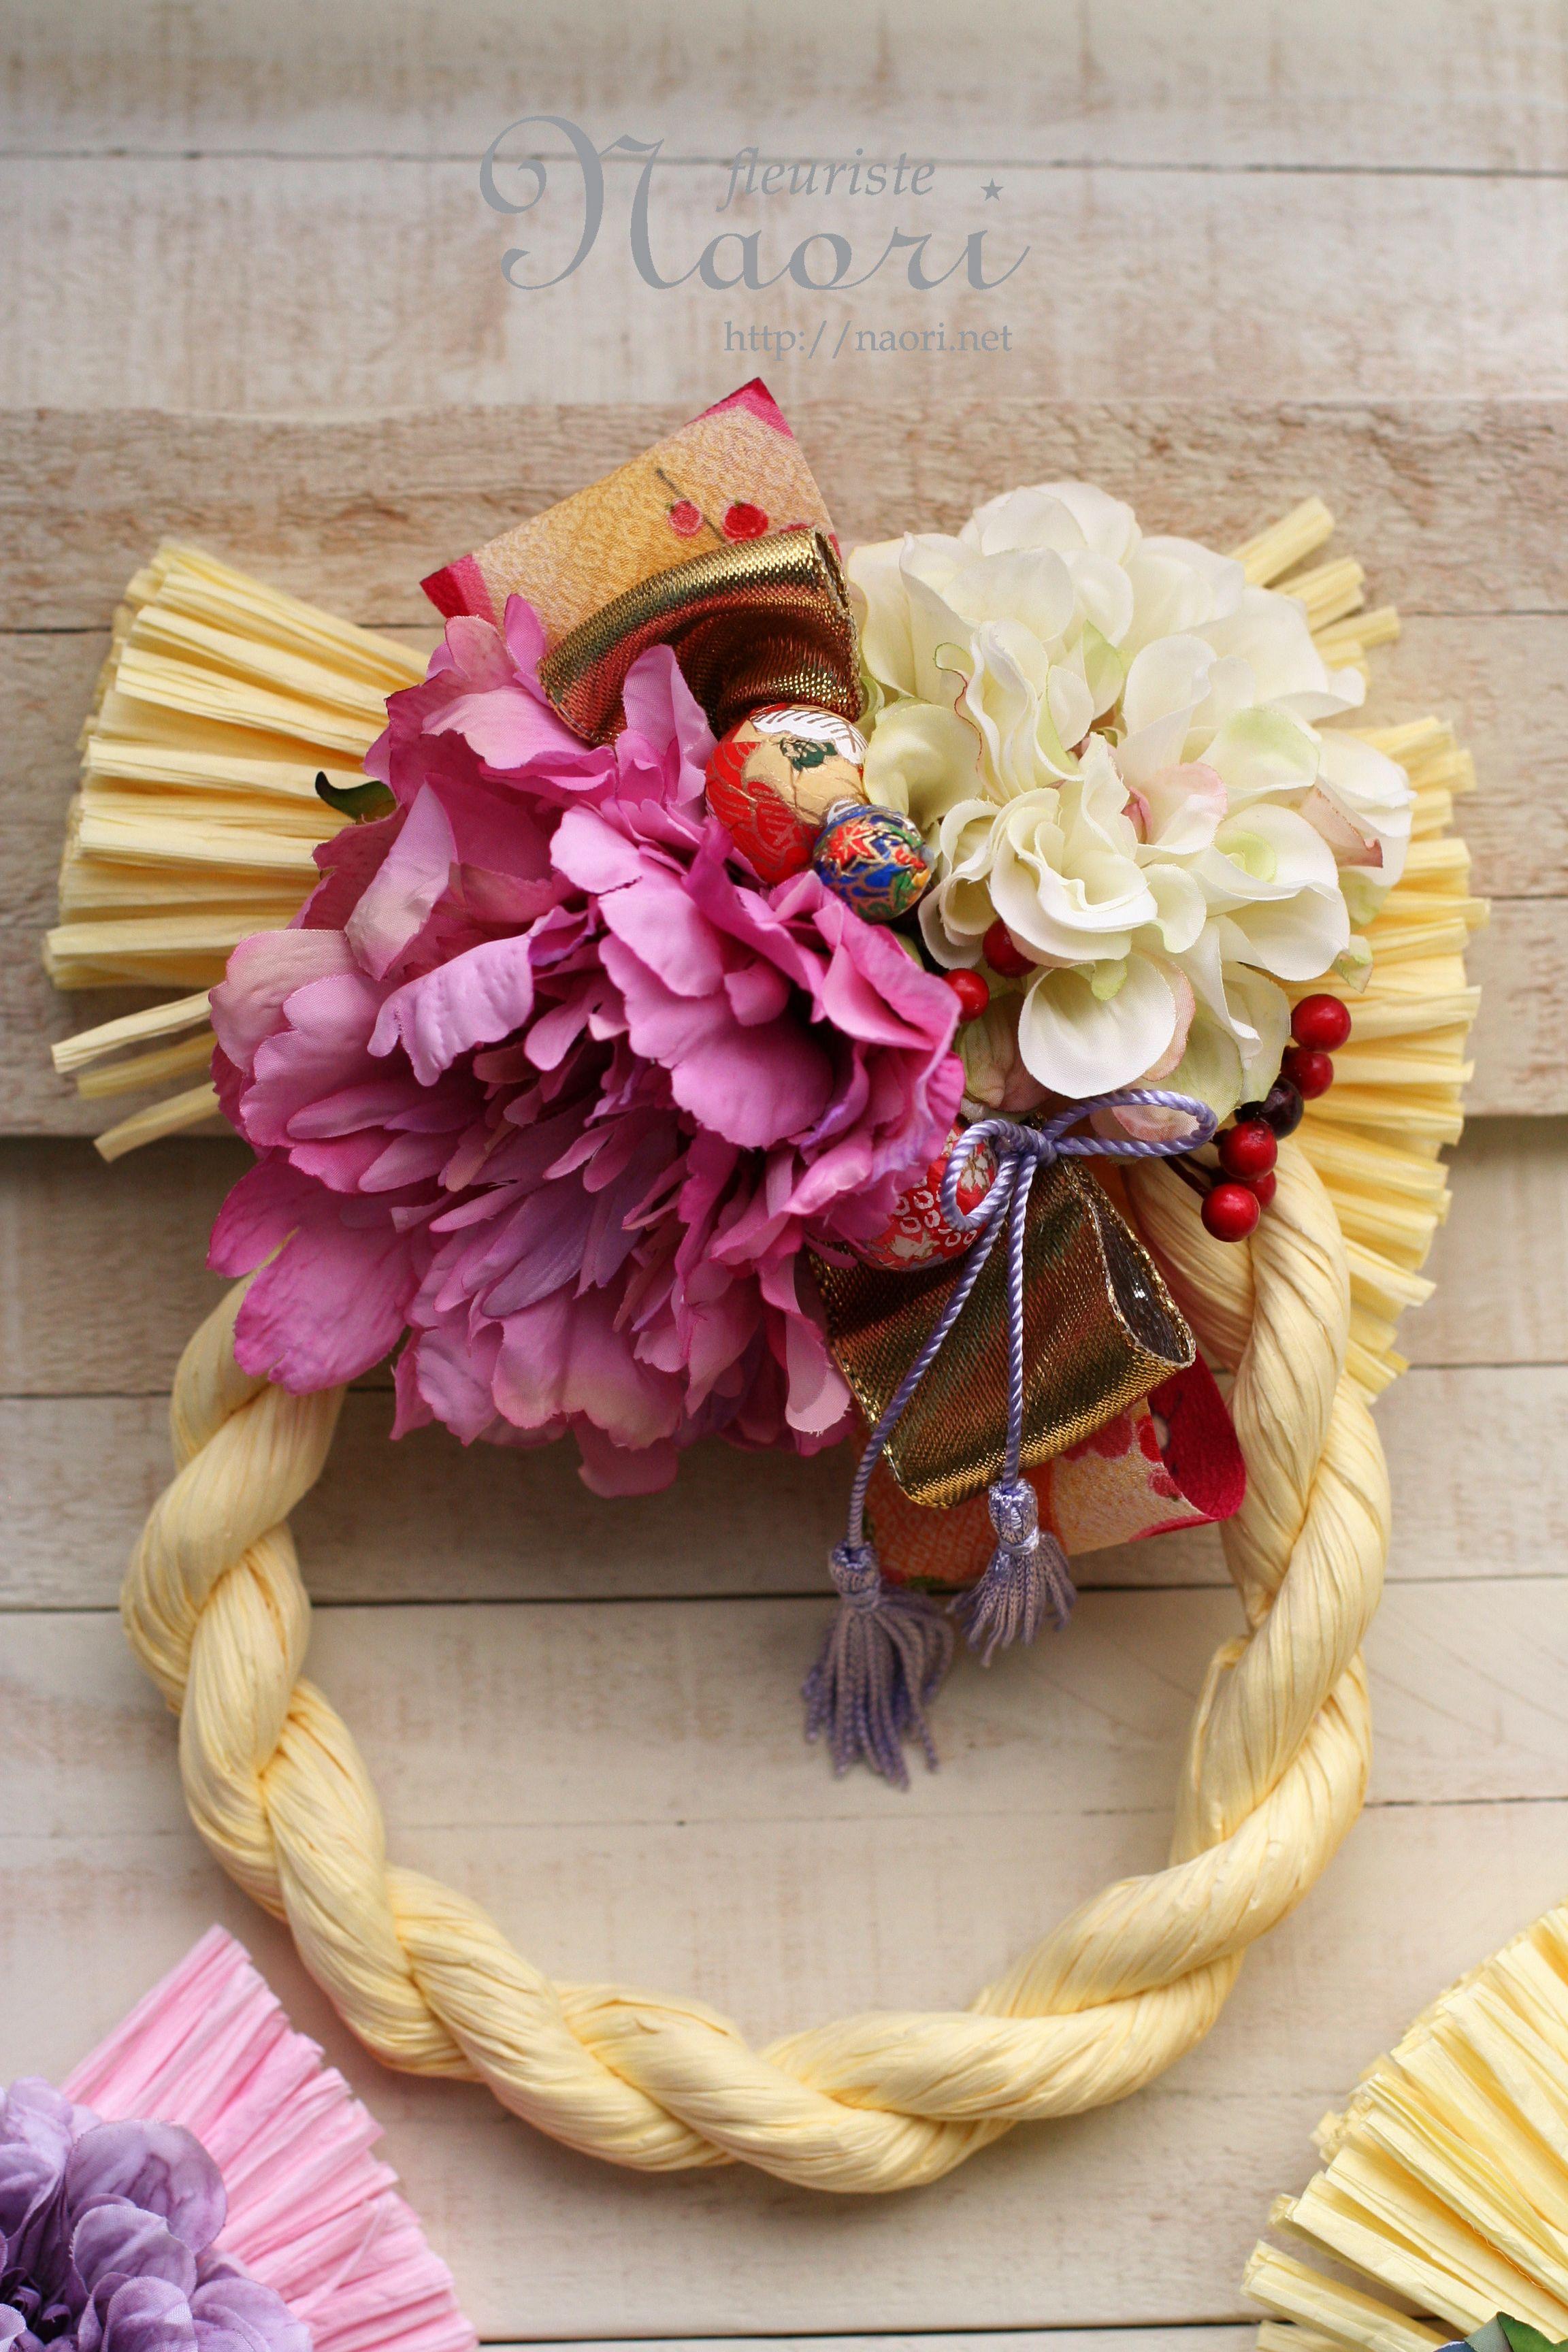 Japanese New Year wreath 2014 お正月アレンジ, お正月 飾り, 正月